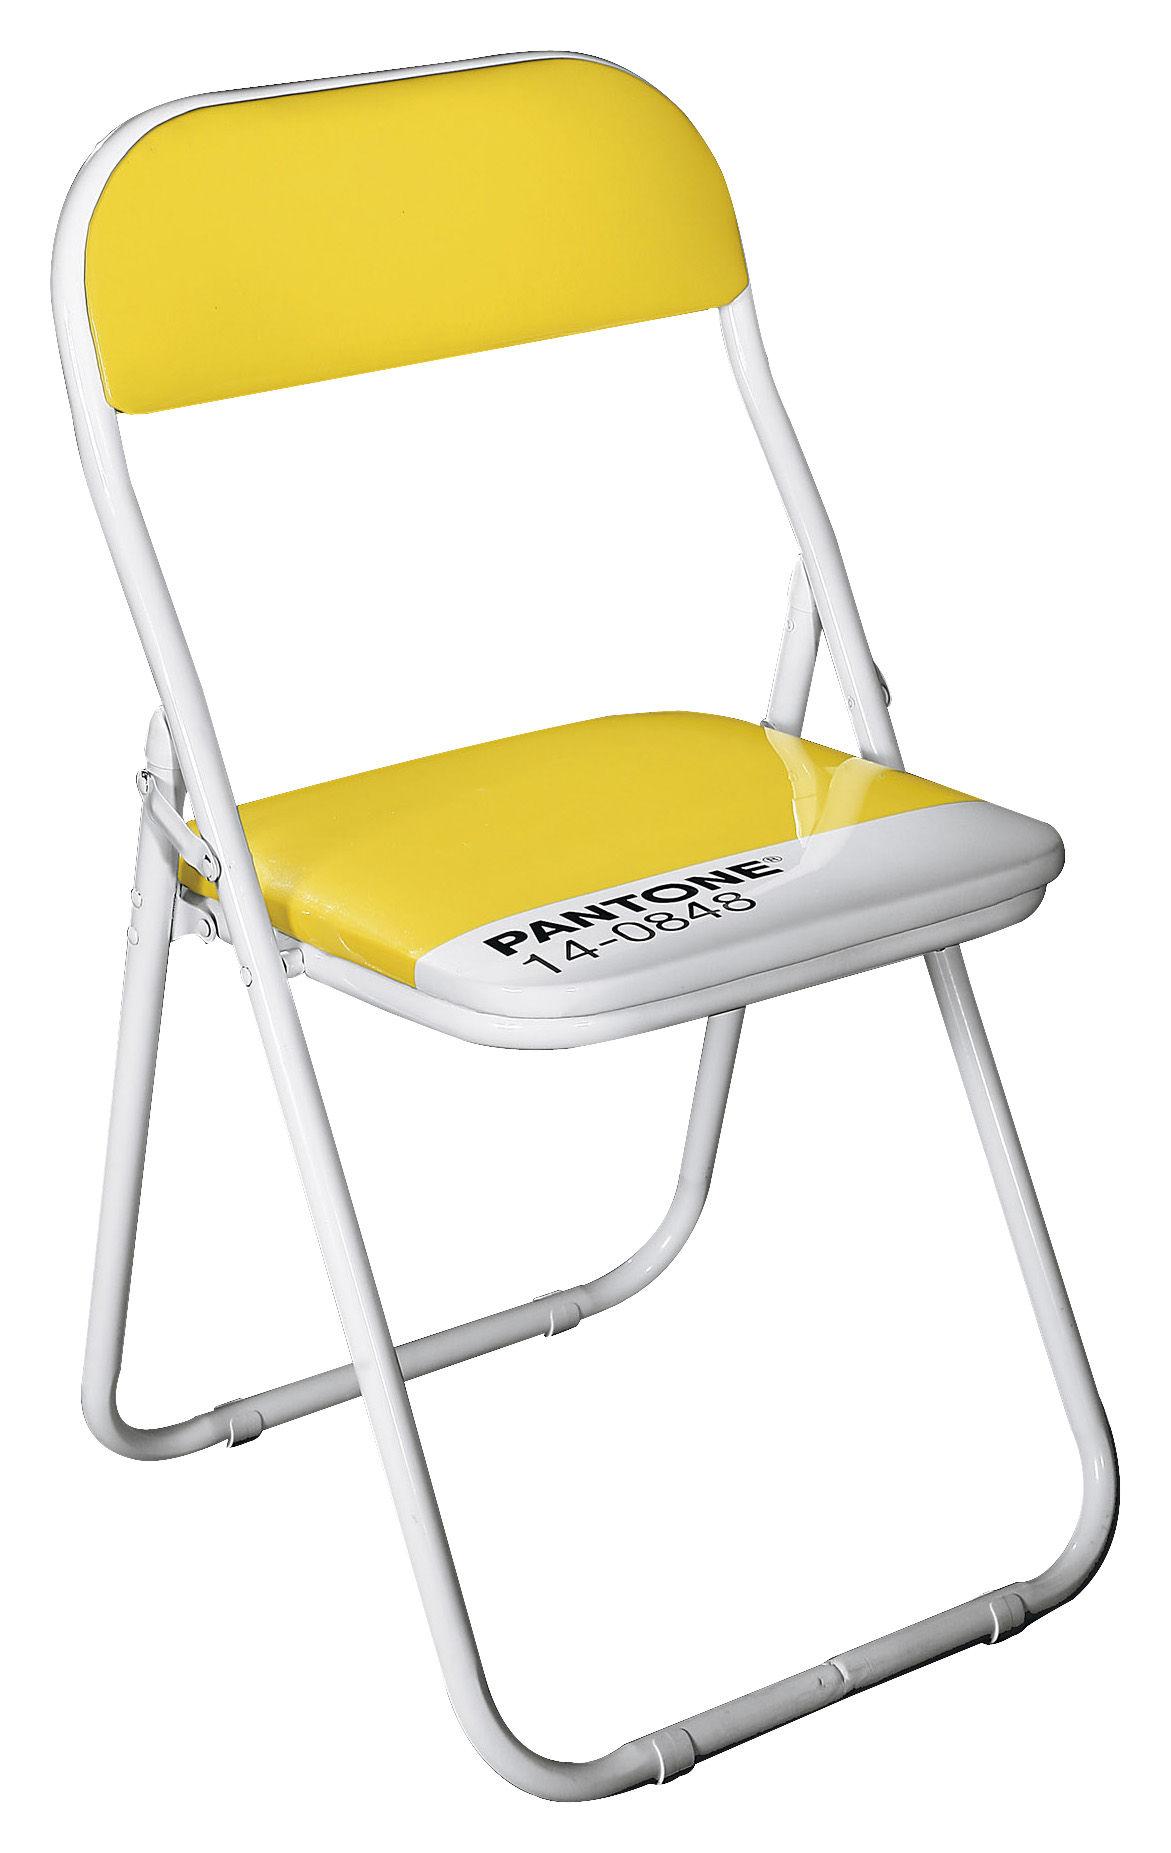 chaise pliante pantone plastique structure m tal 14 0848 jaune mimosa seletti. Black Bedroom Furniture Sets. Home Design Ideas